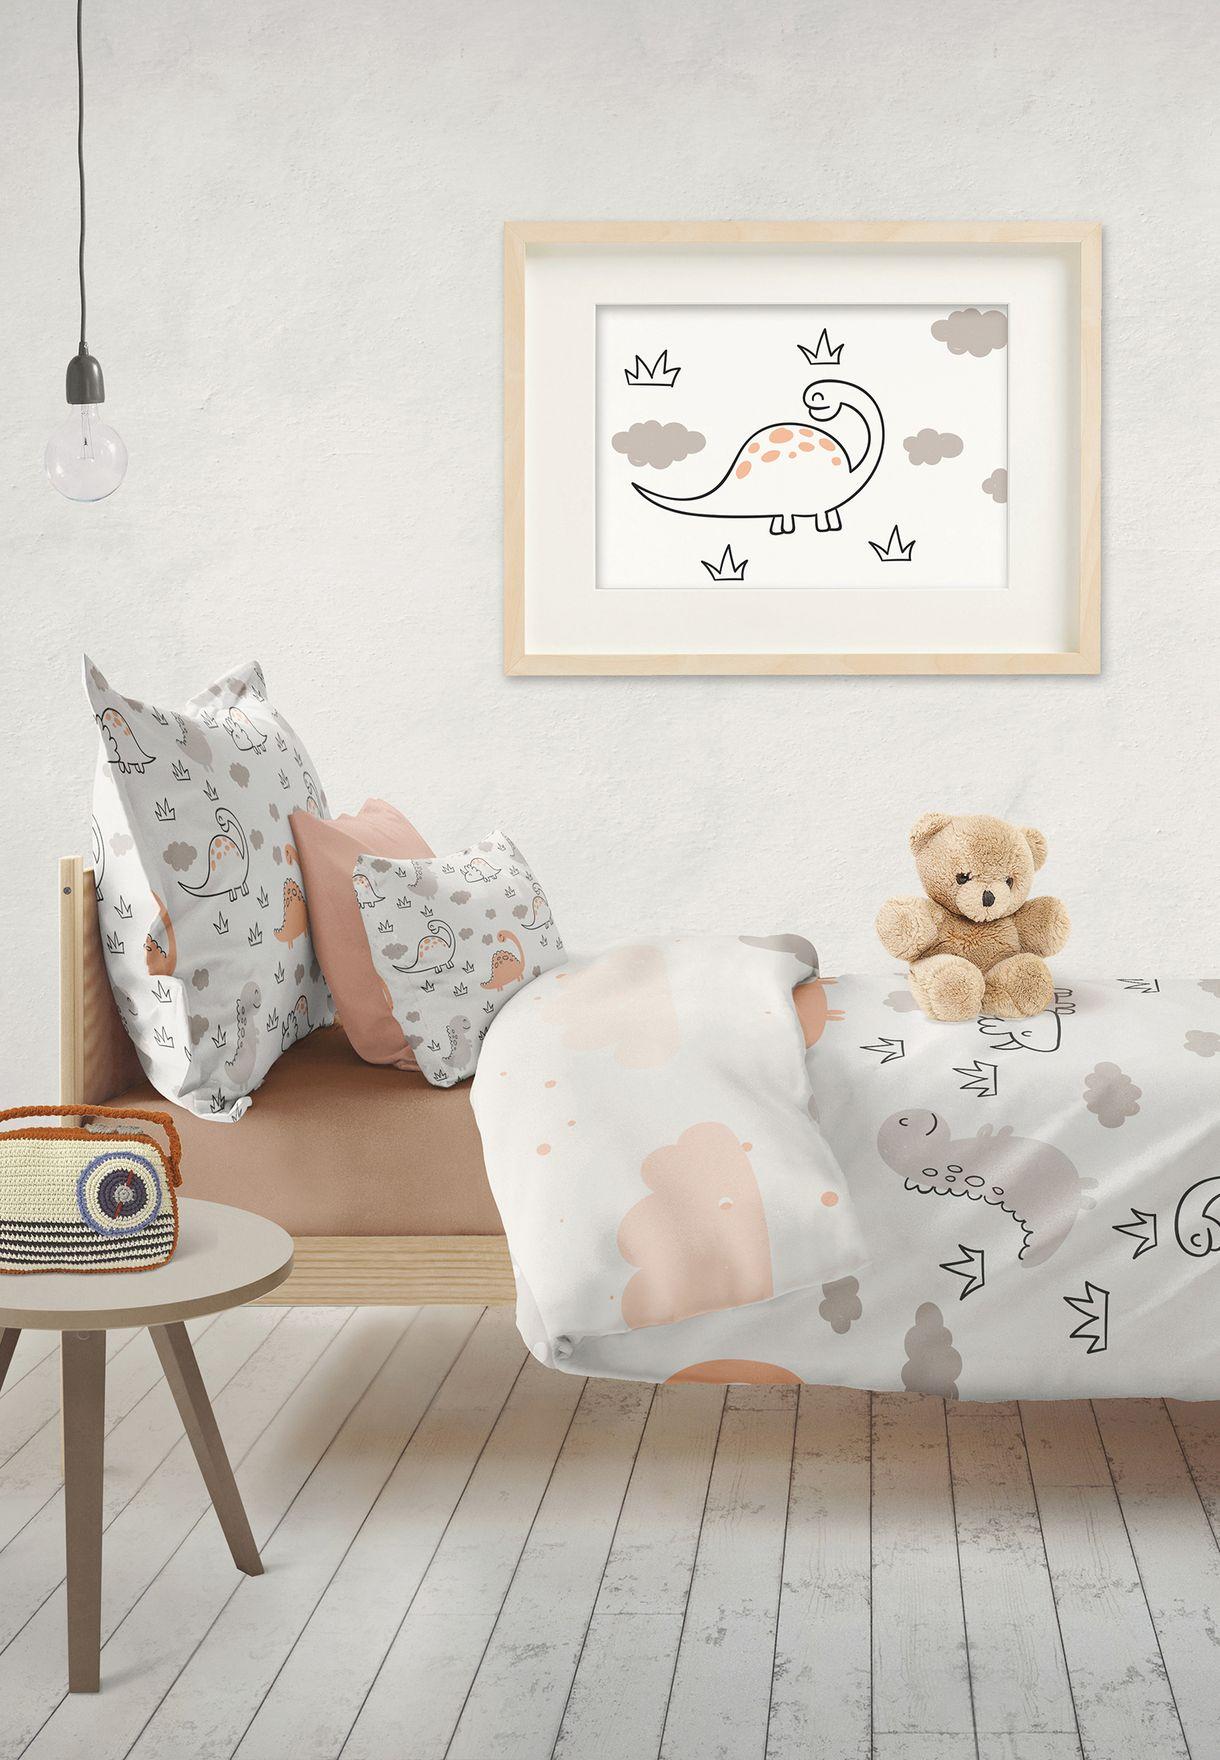 Kids Dinosaur Bed Sheet + Pillow Case Set Single